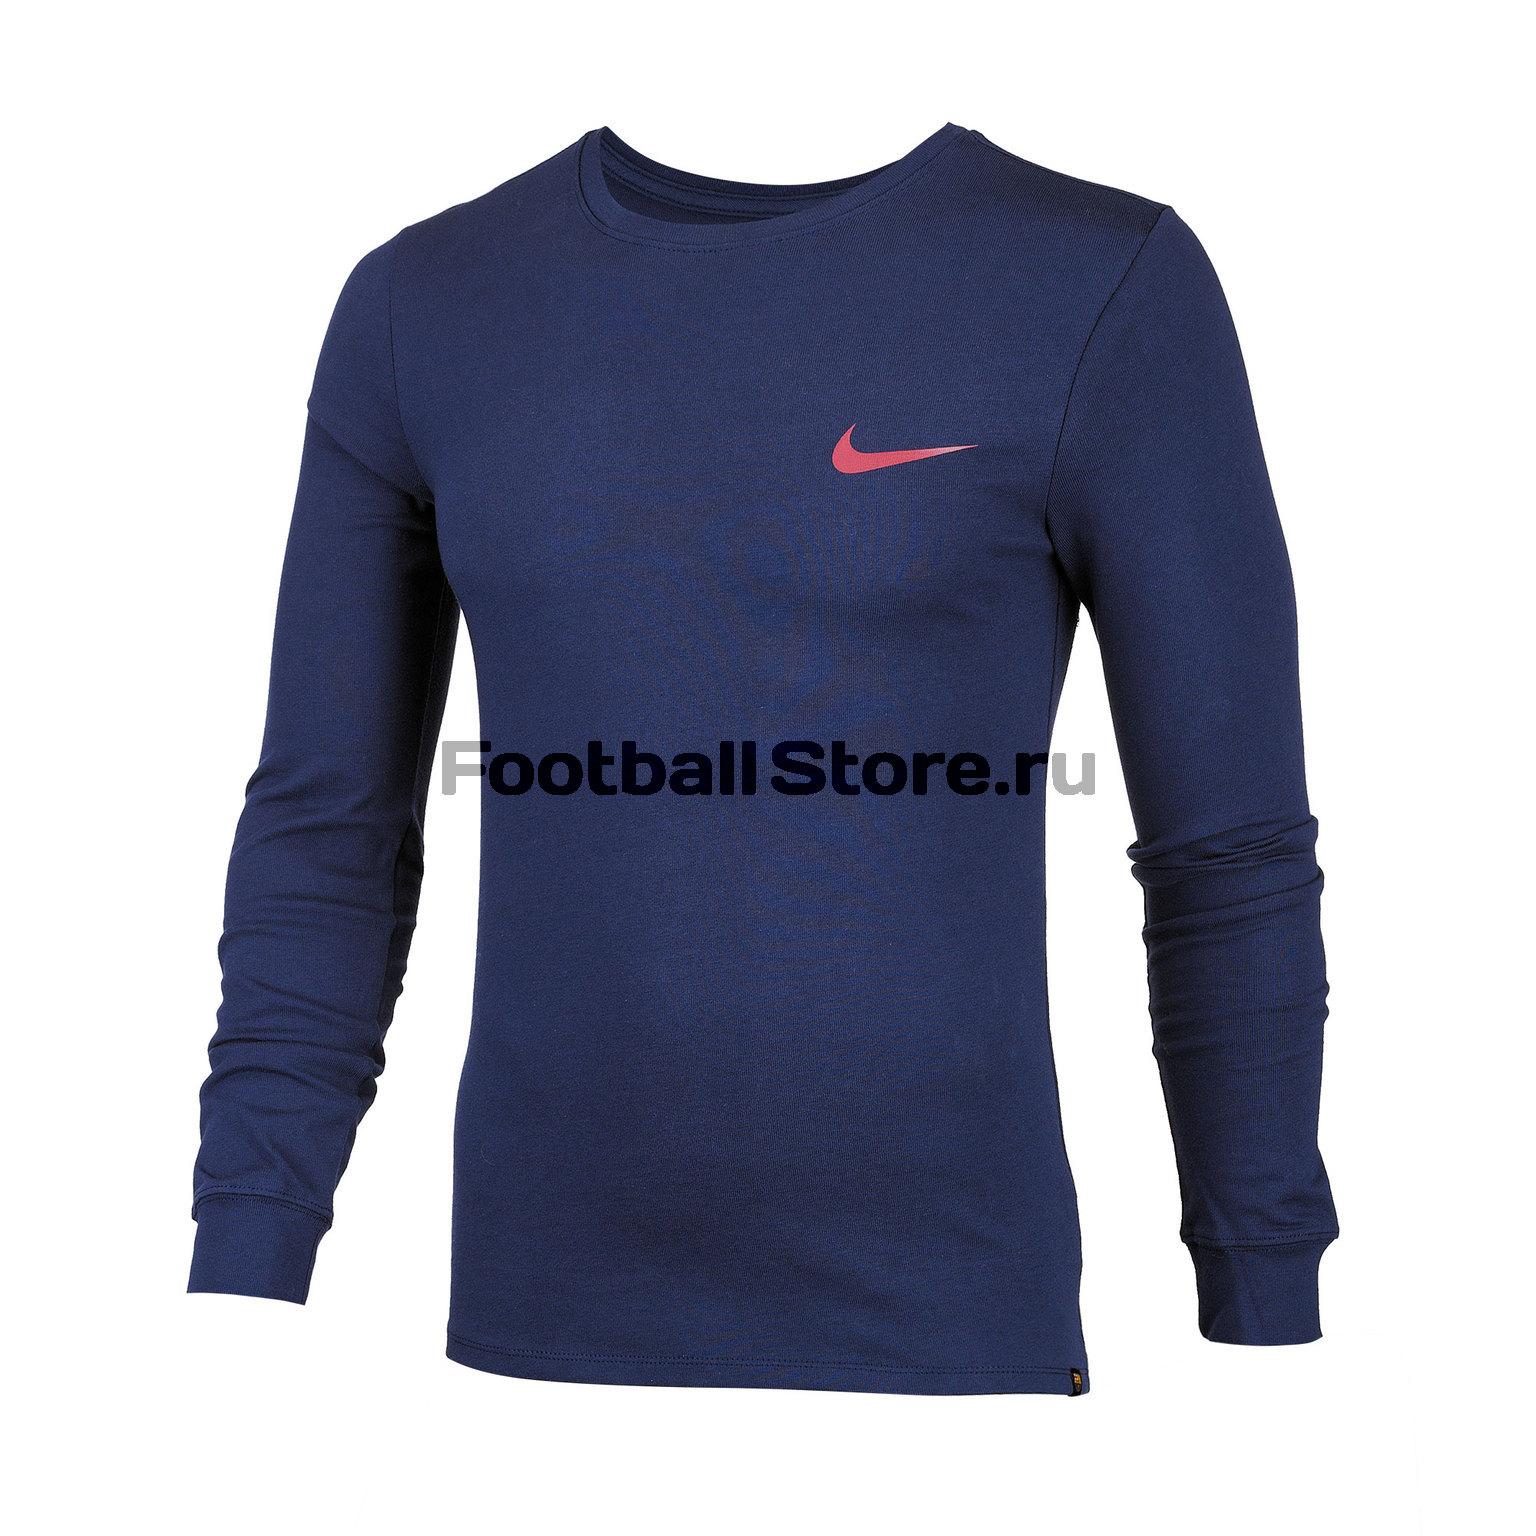 Футболка с длинным рукавом Nike Barcelona Tee Squad AA5706-451 футболка с длинным рукавом asics 156859 0904 man long sleeve tee